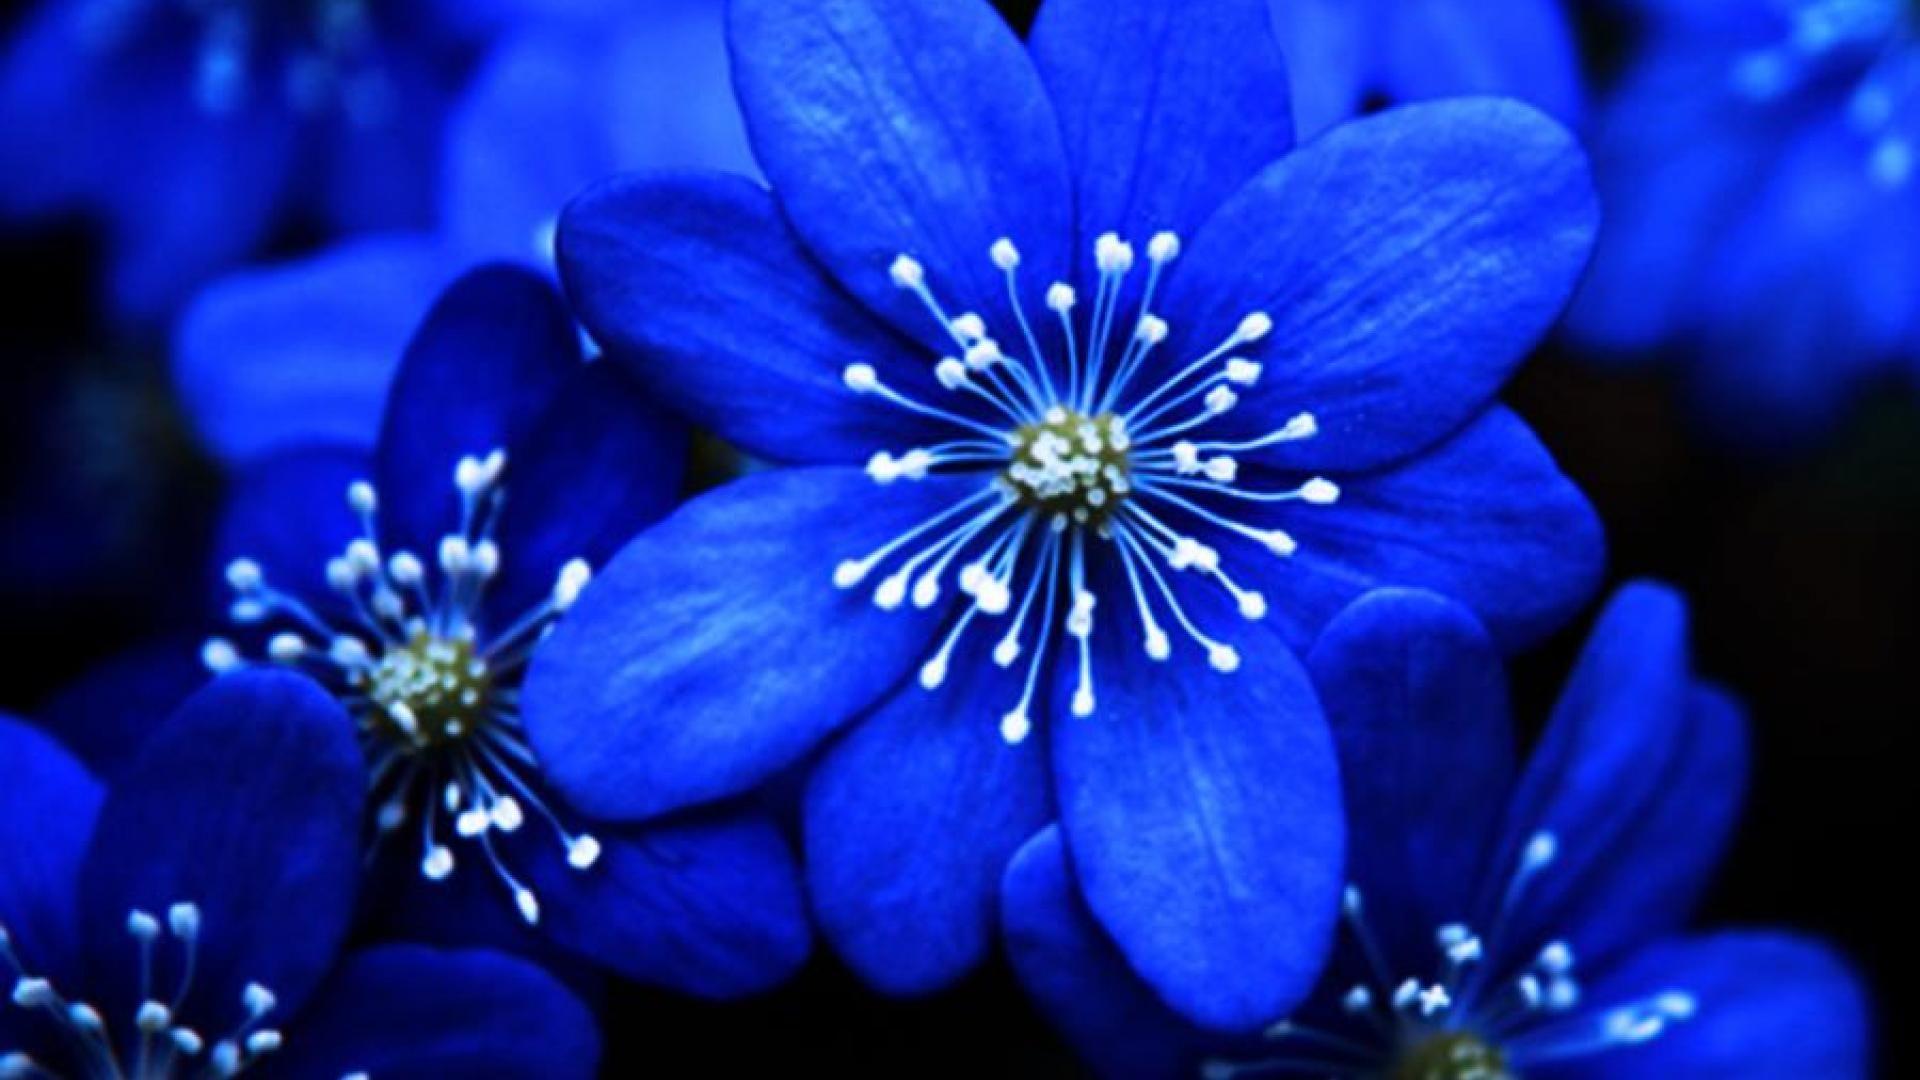 「blue flower photo」の画像検索結果